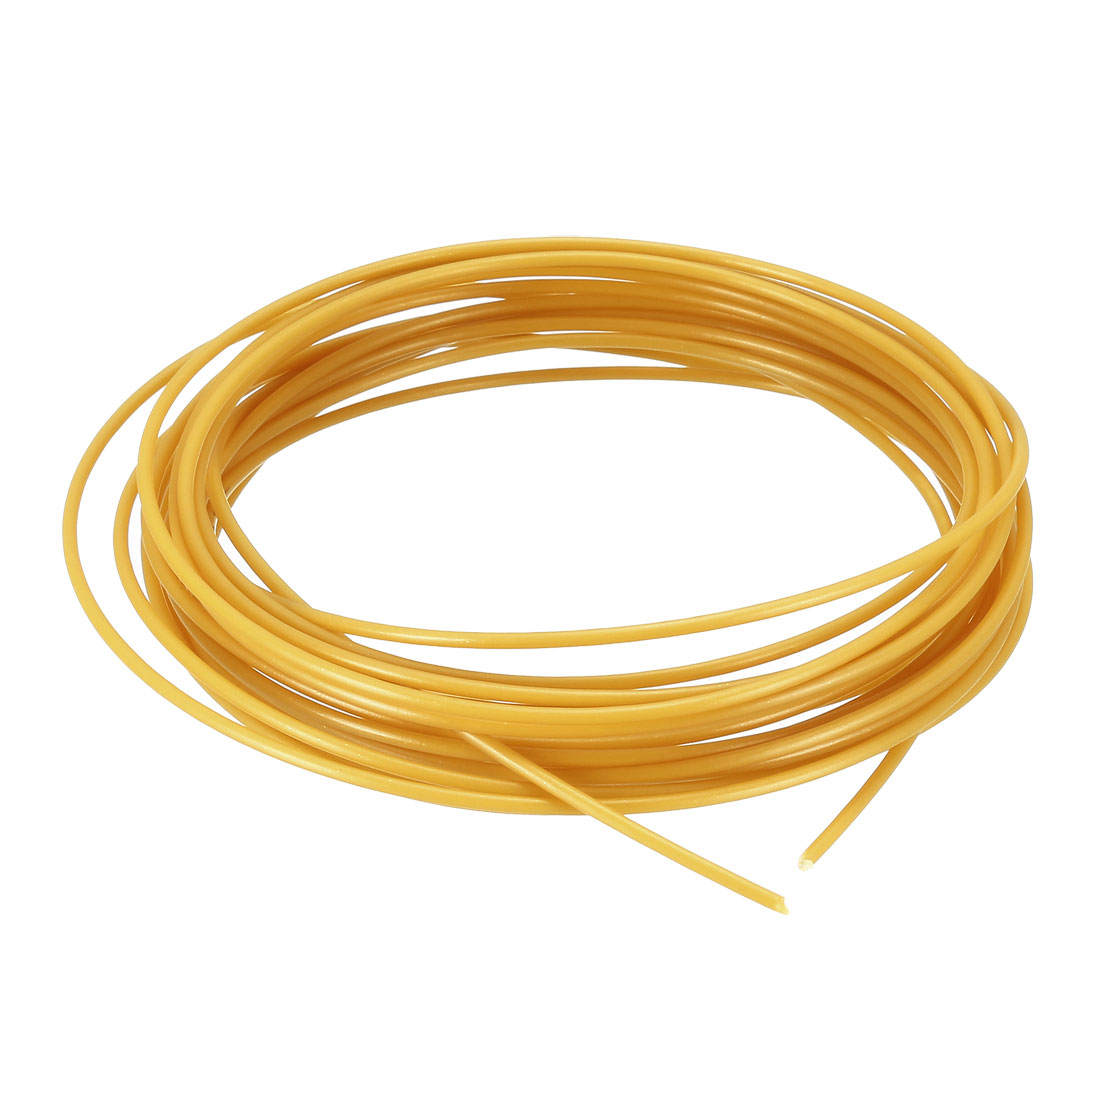 5 Meter/16 Ft PCL 3D Pen/3D Printer Filament, 1.75 mm Golden